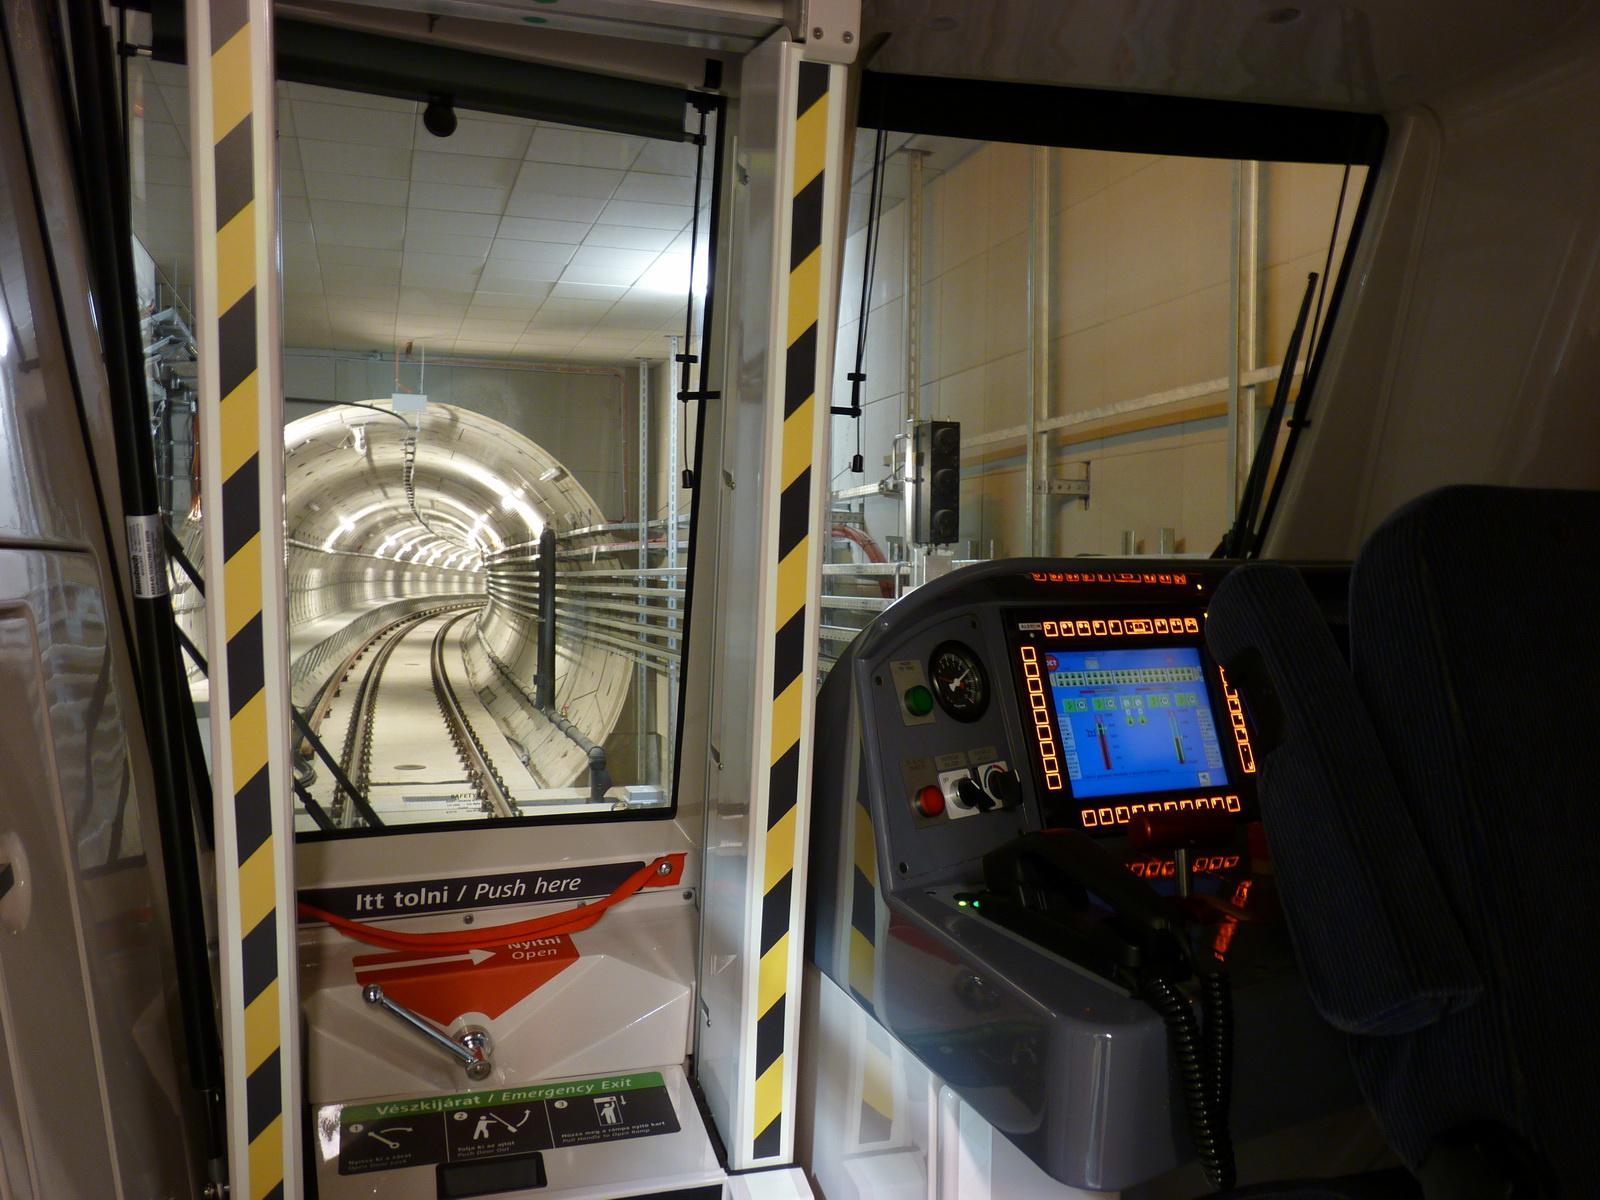 LoviGabi: M4 tesztfutas Alstom 20121129-07